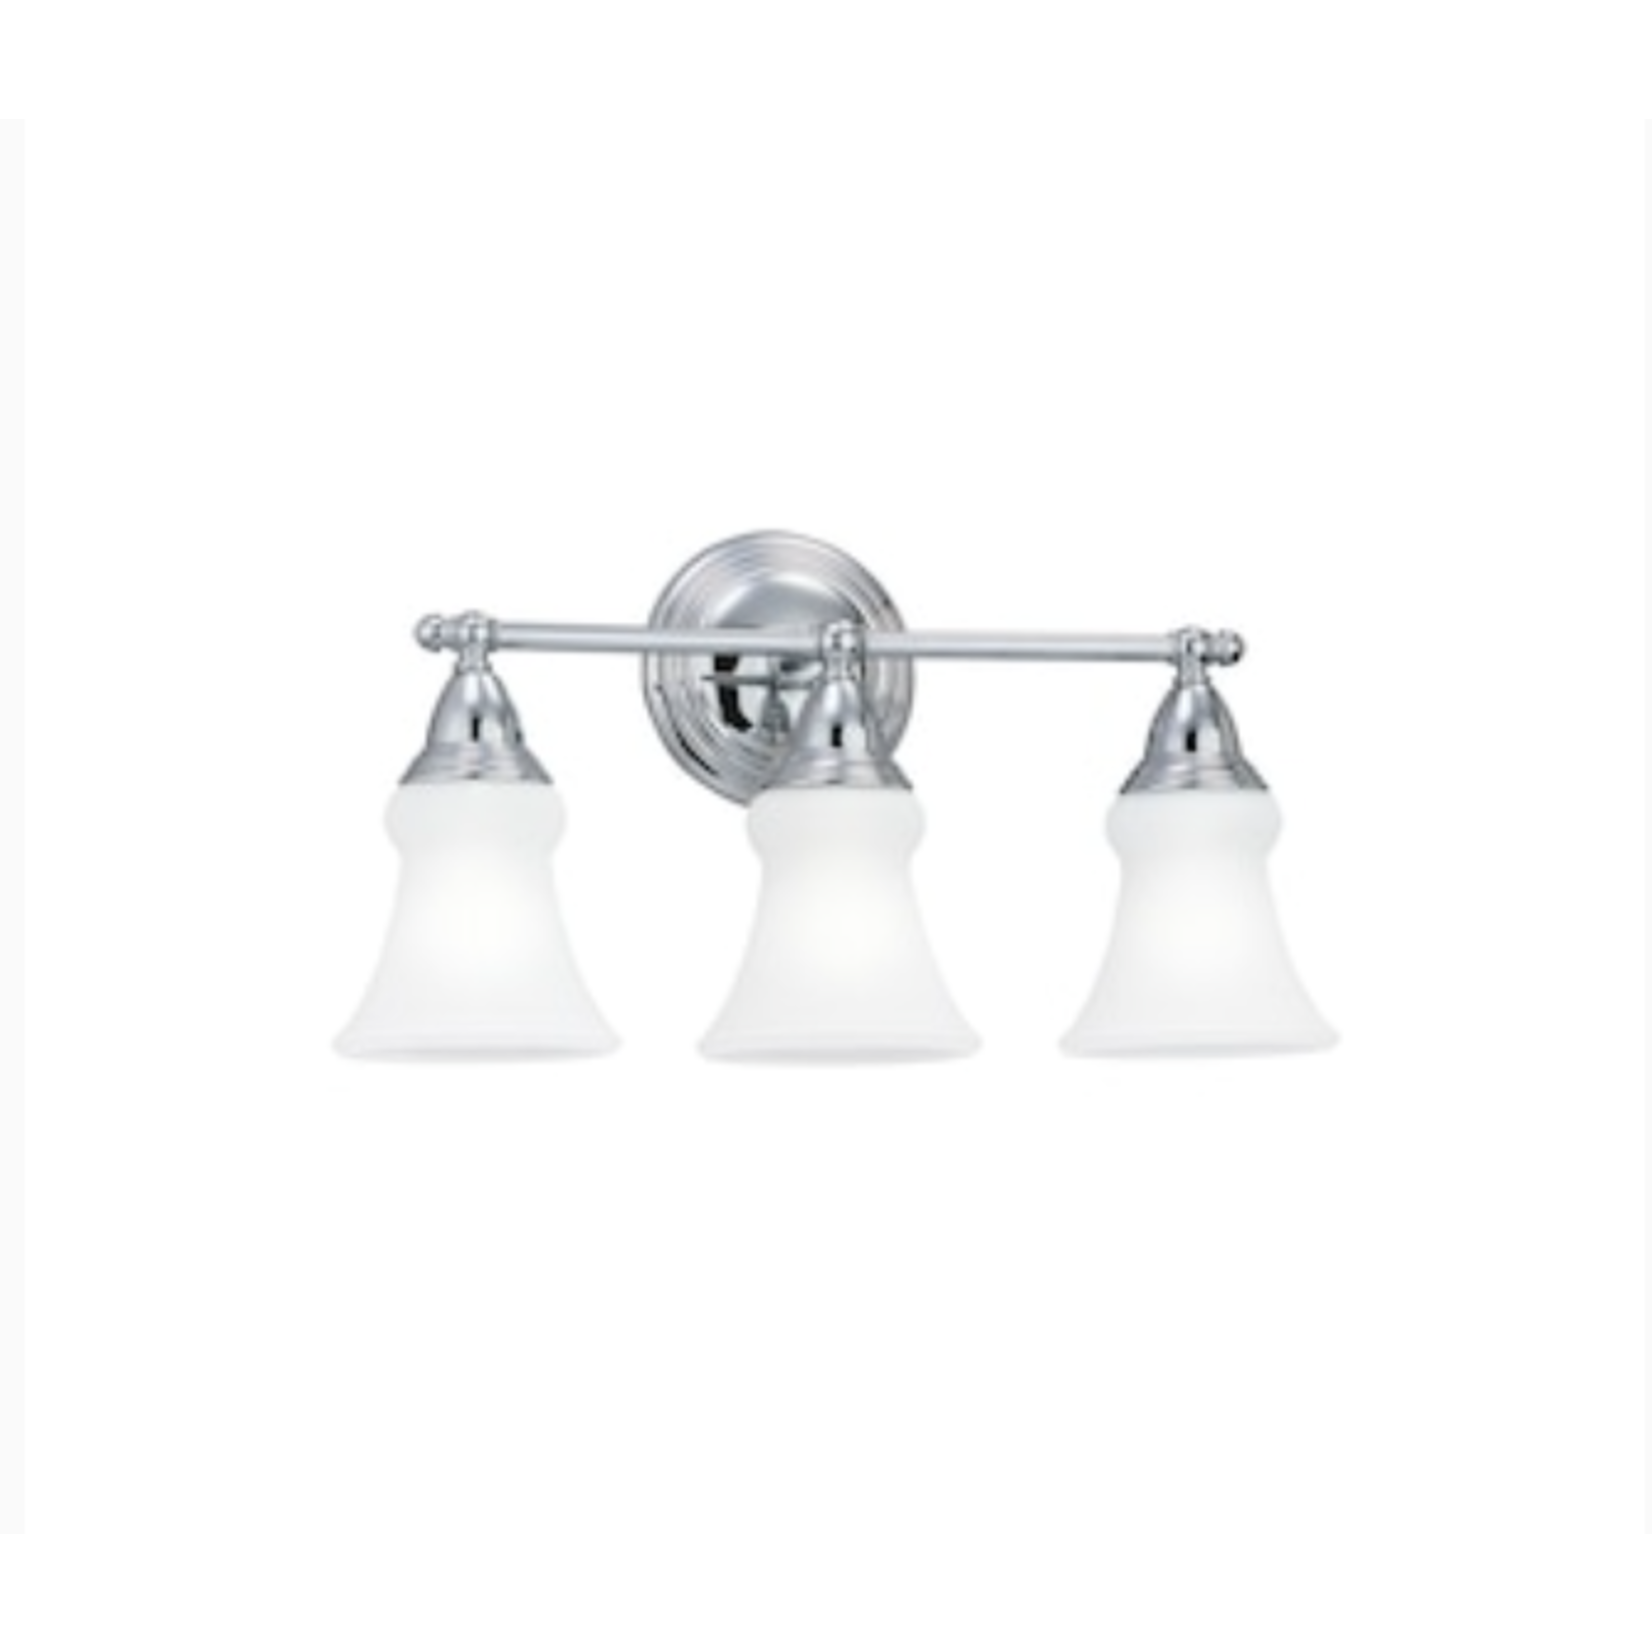 10212 Seagull Lighting Sagemore 3 Light Vanity Light